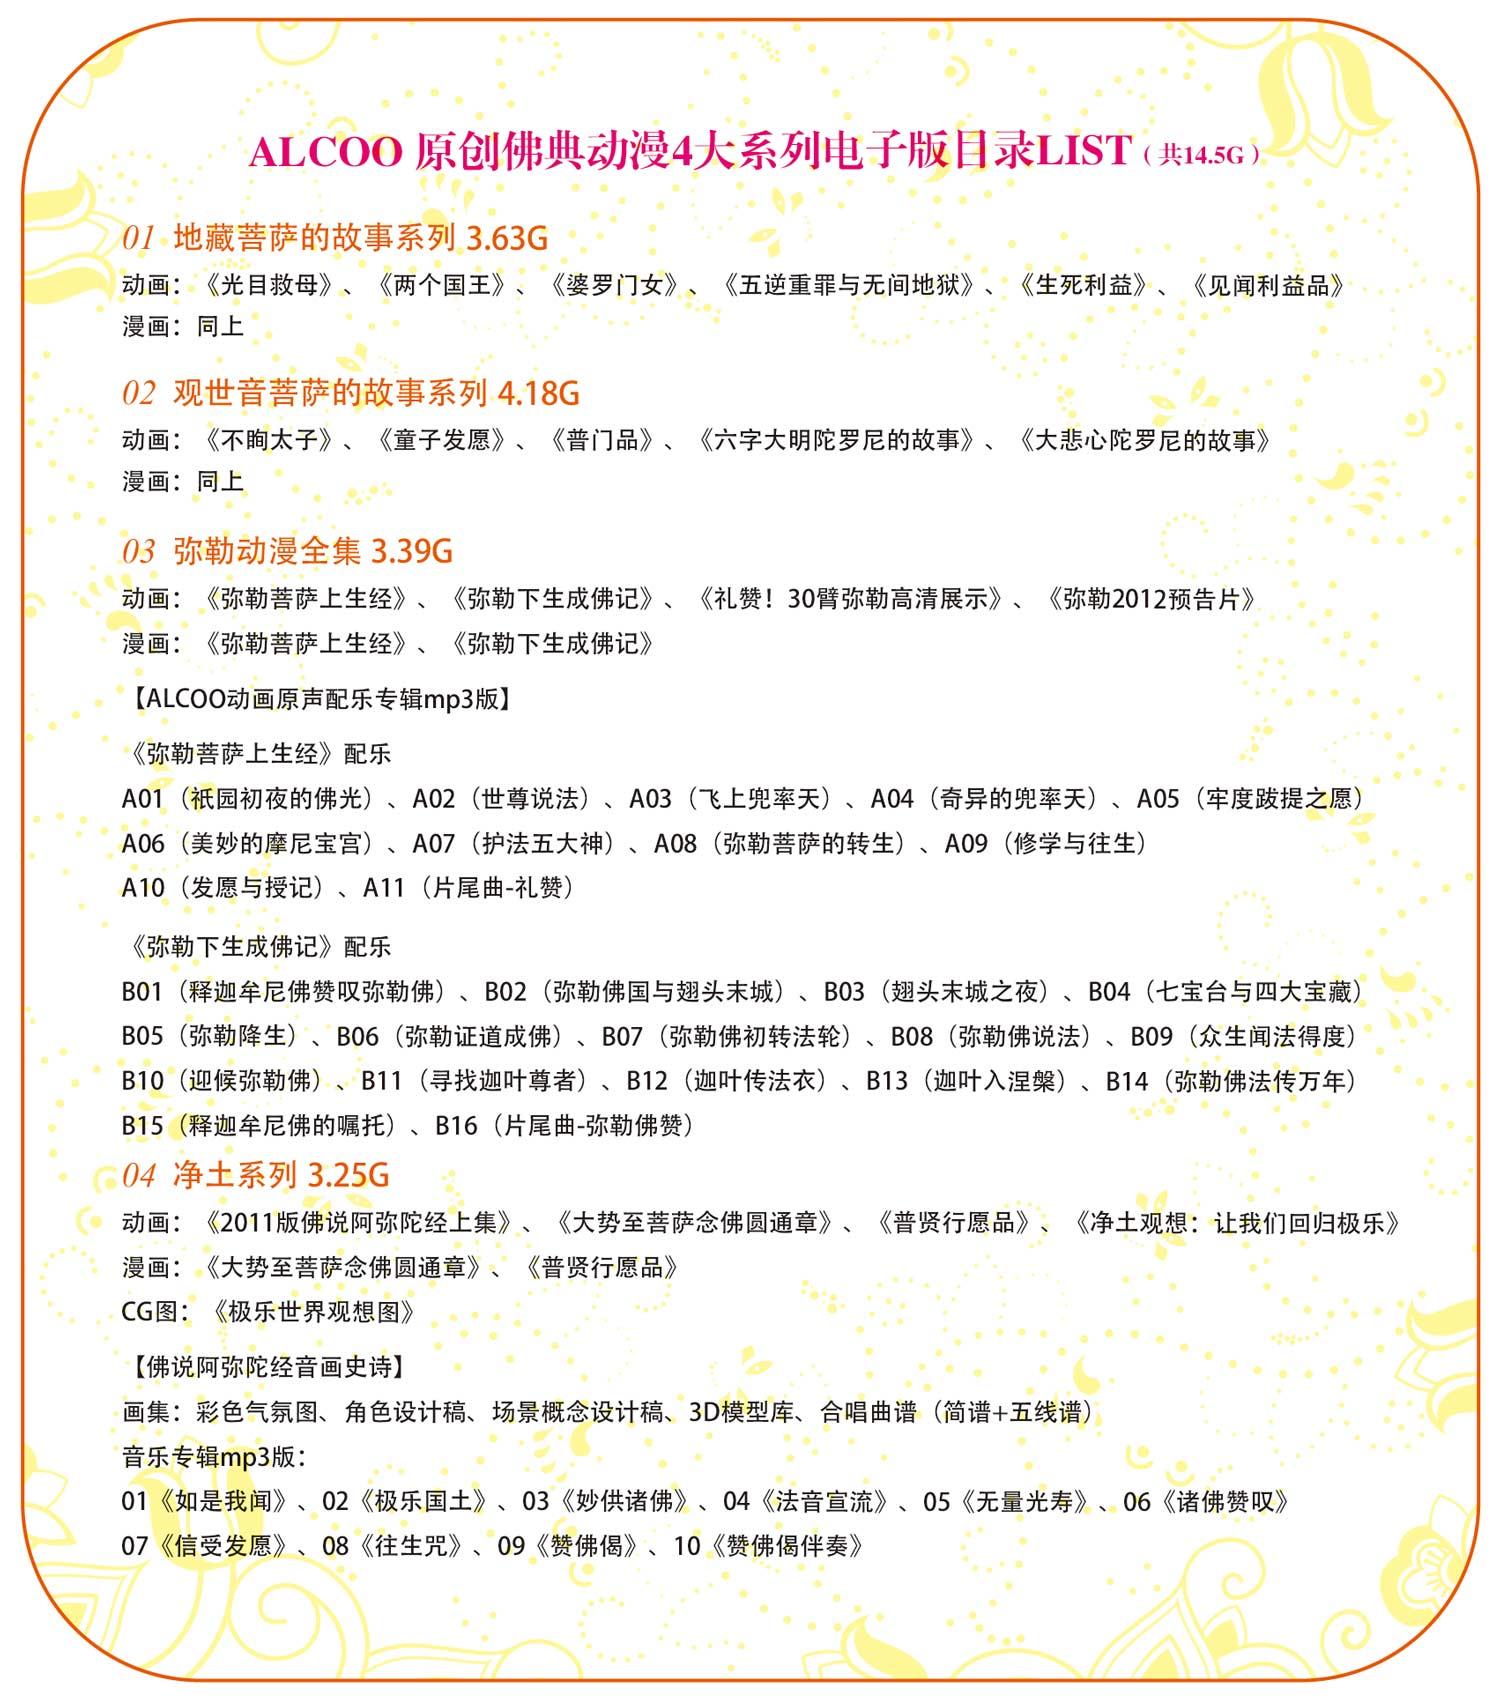 ALCOO原创佛典动漫4大系列电子版目录LIST.jpg